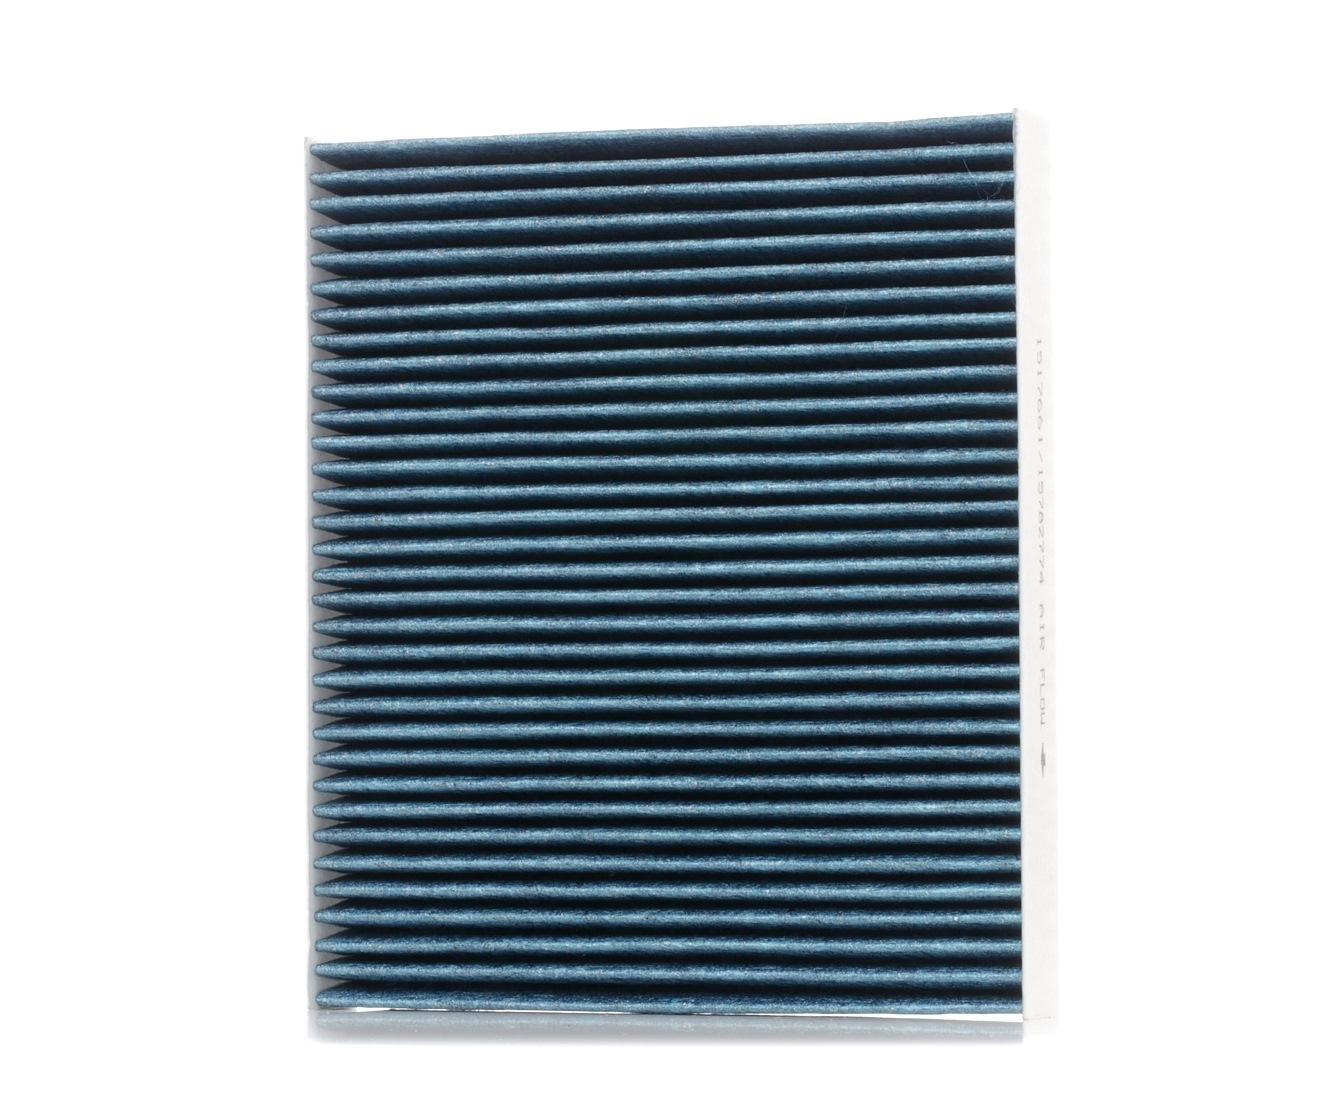 AUDI A2 2004 Innenraumluftfilter - Original RIDEX 424I0491 Breite: 215,5mm, Höhe: 32mm, Länge: 252mm